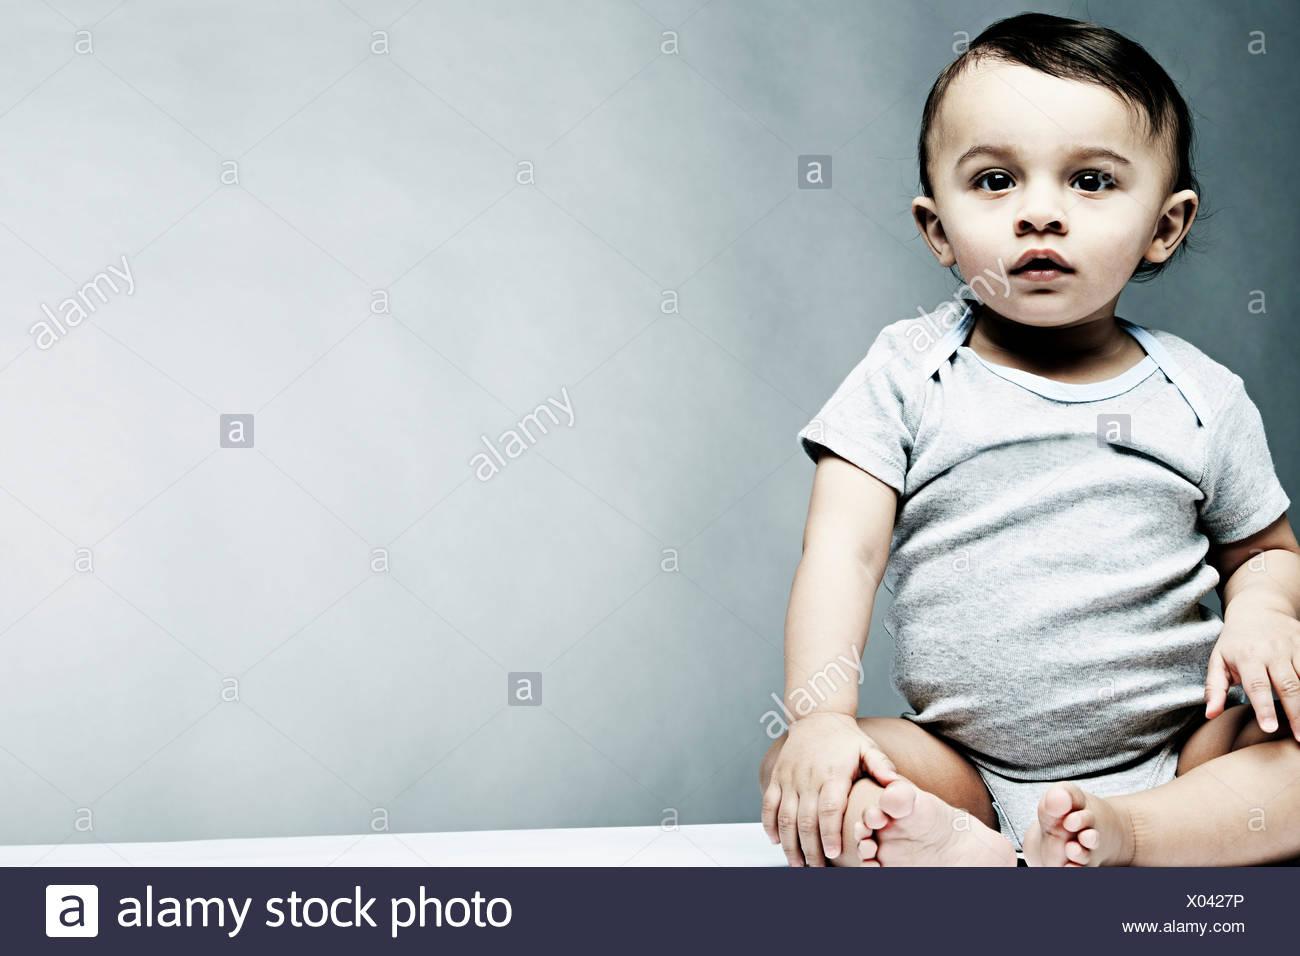 Portrait of baby boy wearing grey baby vest - Stock Image